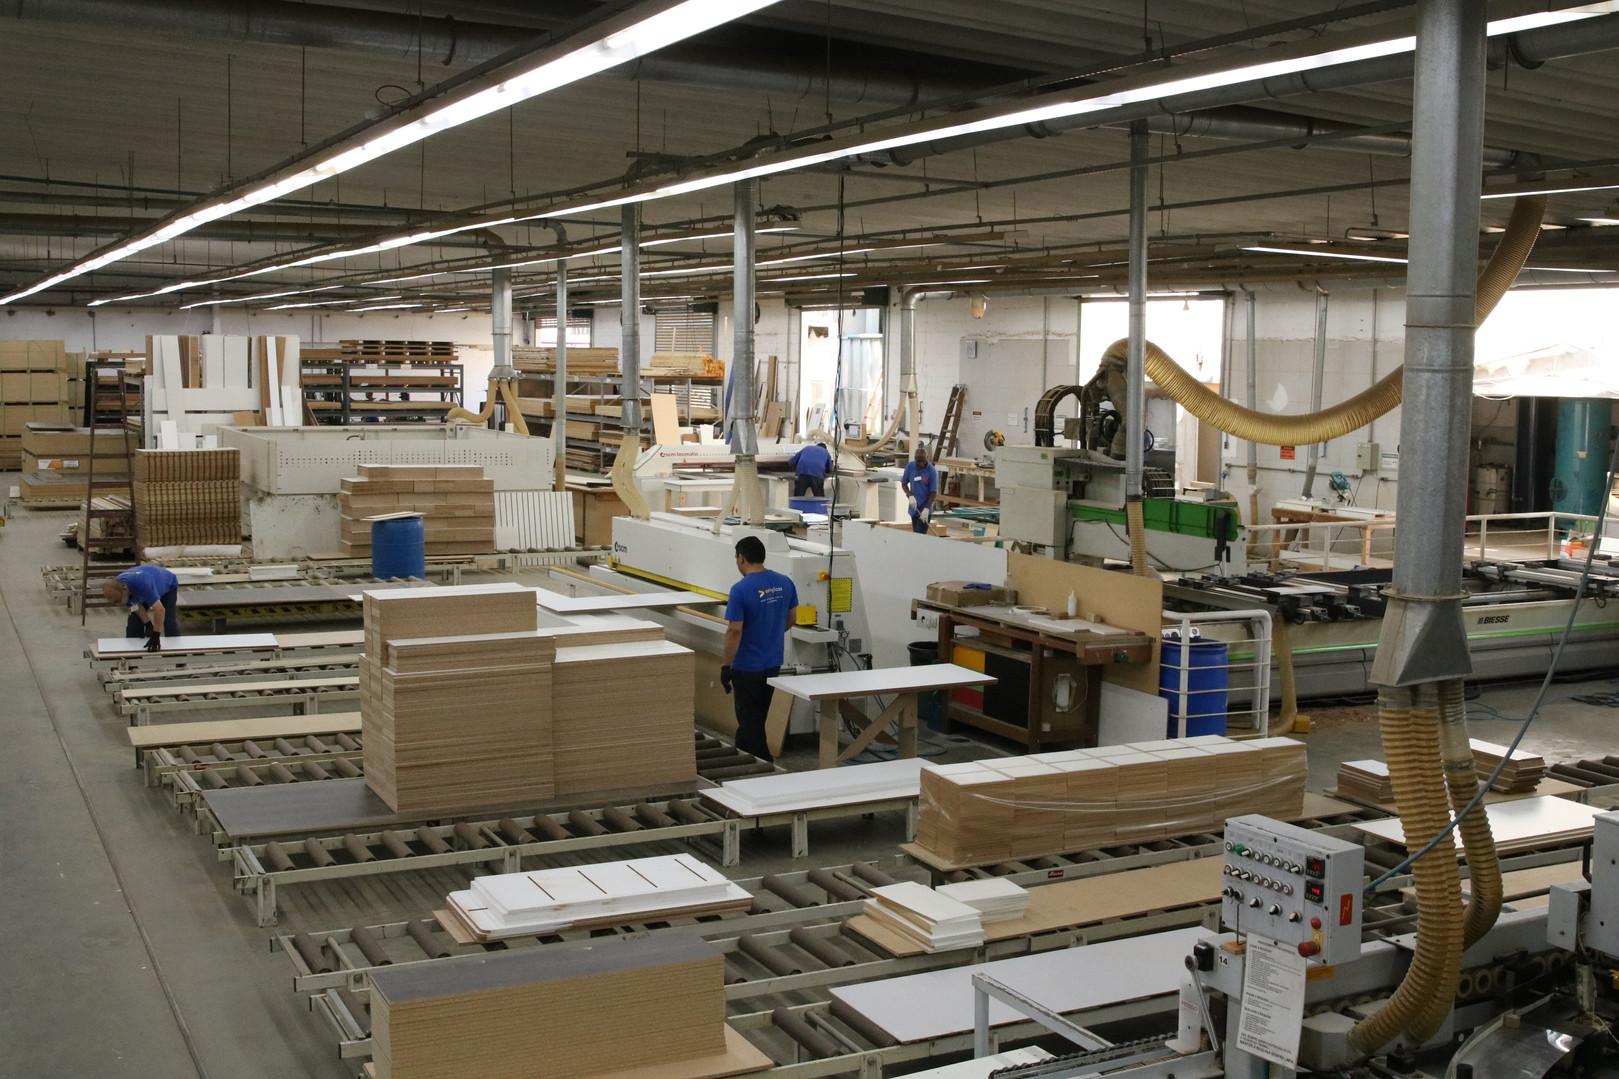 Fábrica Art Glass Expositores